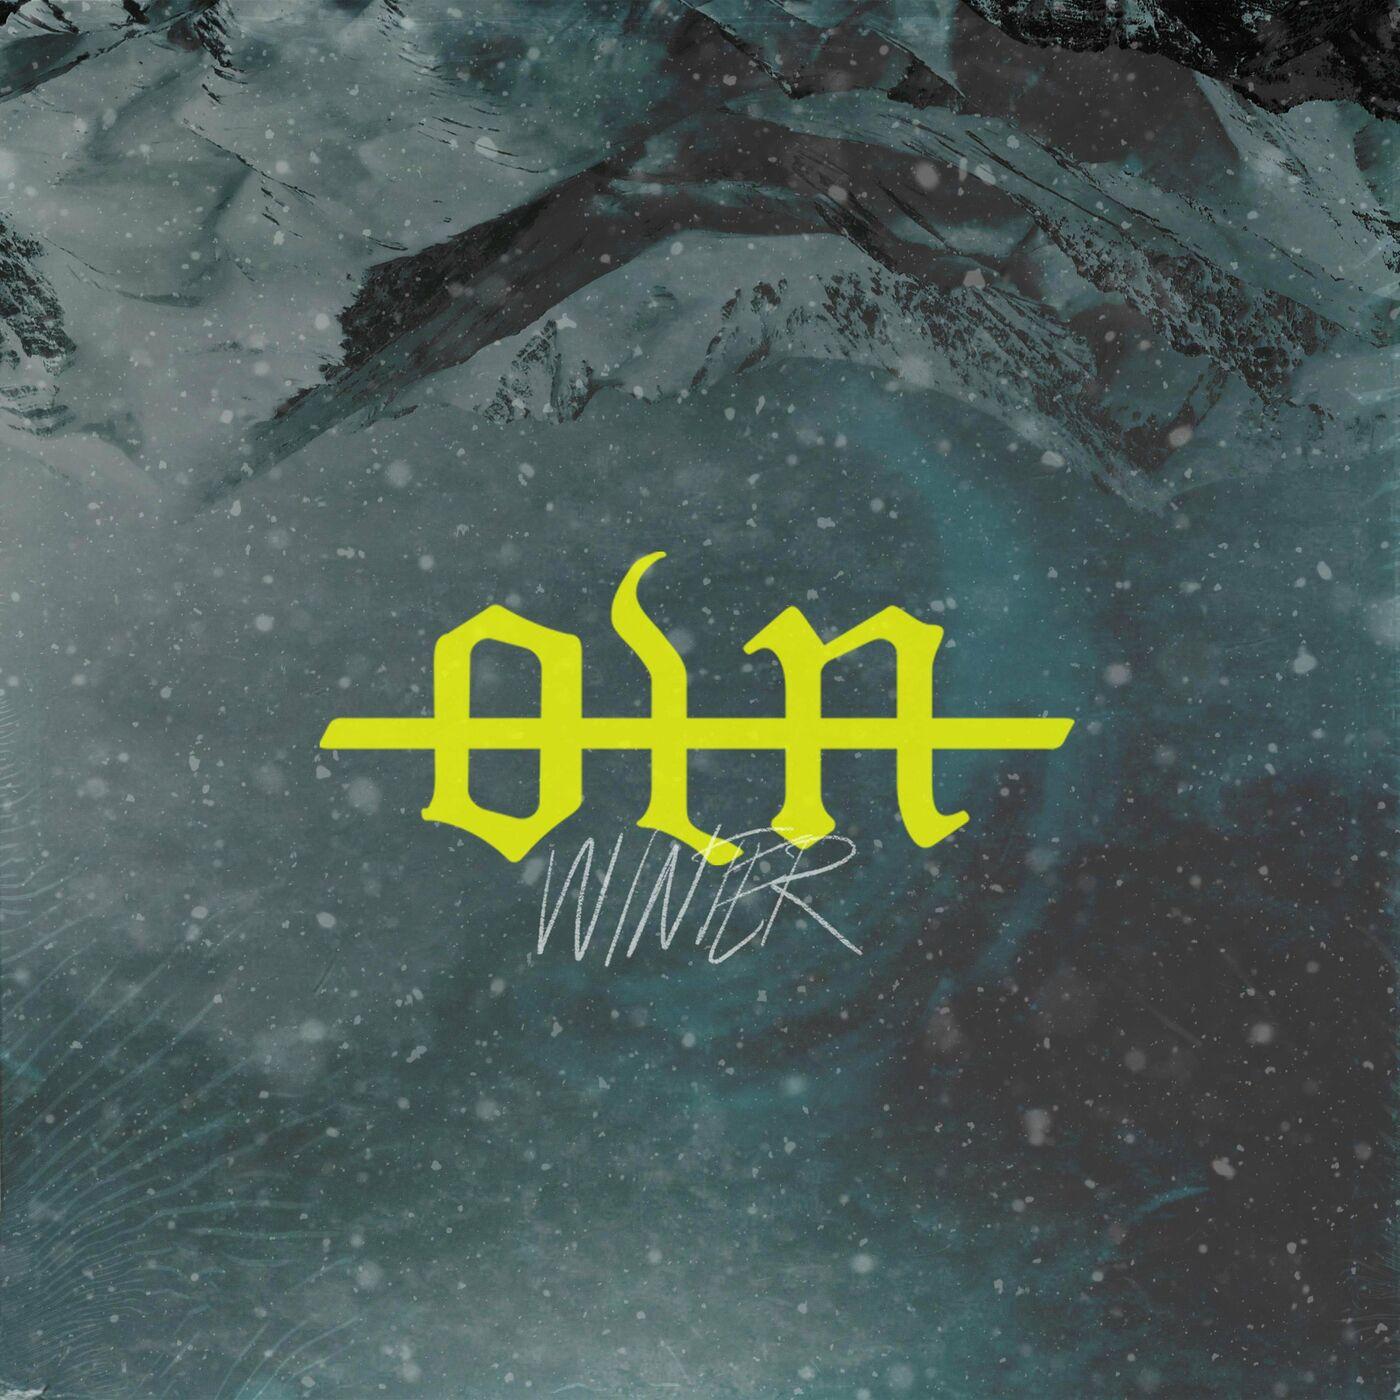 Our Last Night - winter [single] (2021)